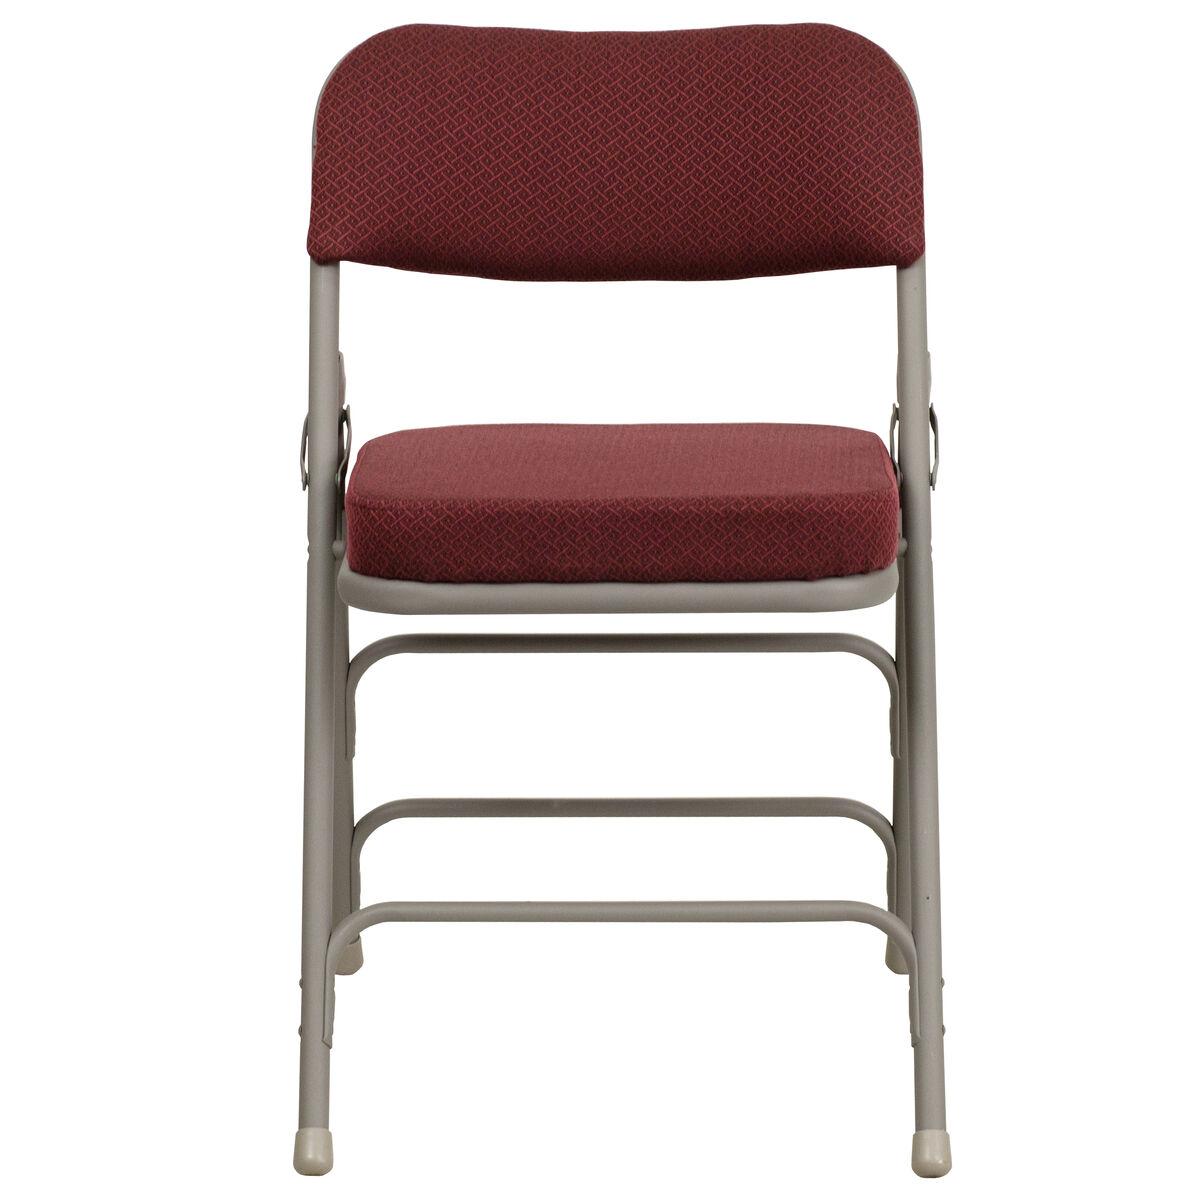 Burgundy Fabric Folding Chair Ha Mc320af Bg Gg